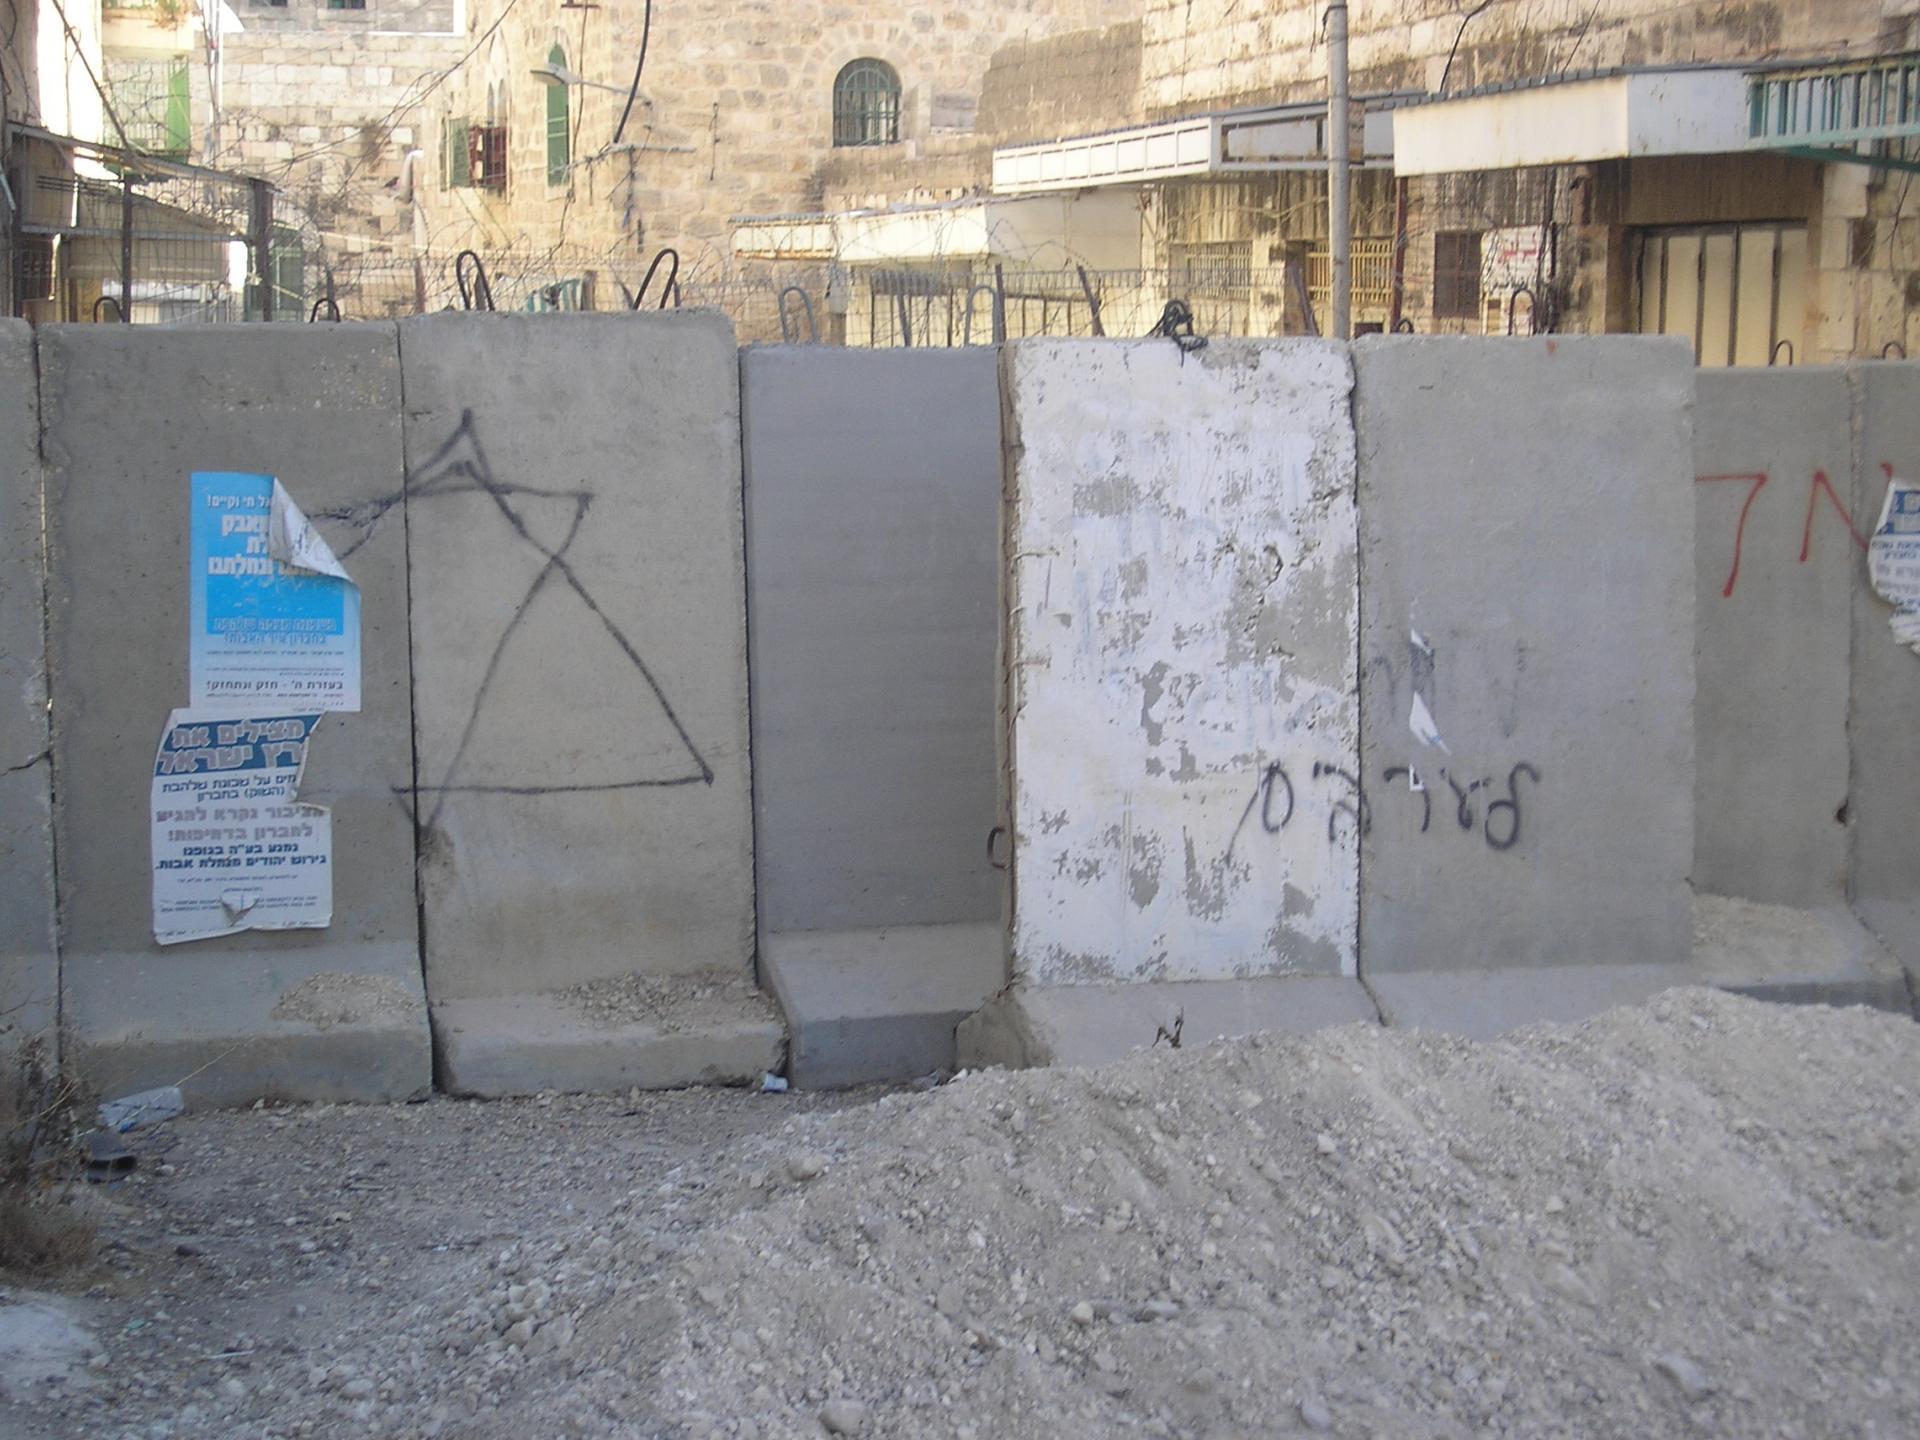 Hebron 19.09.06